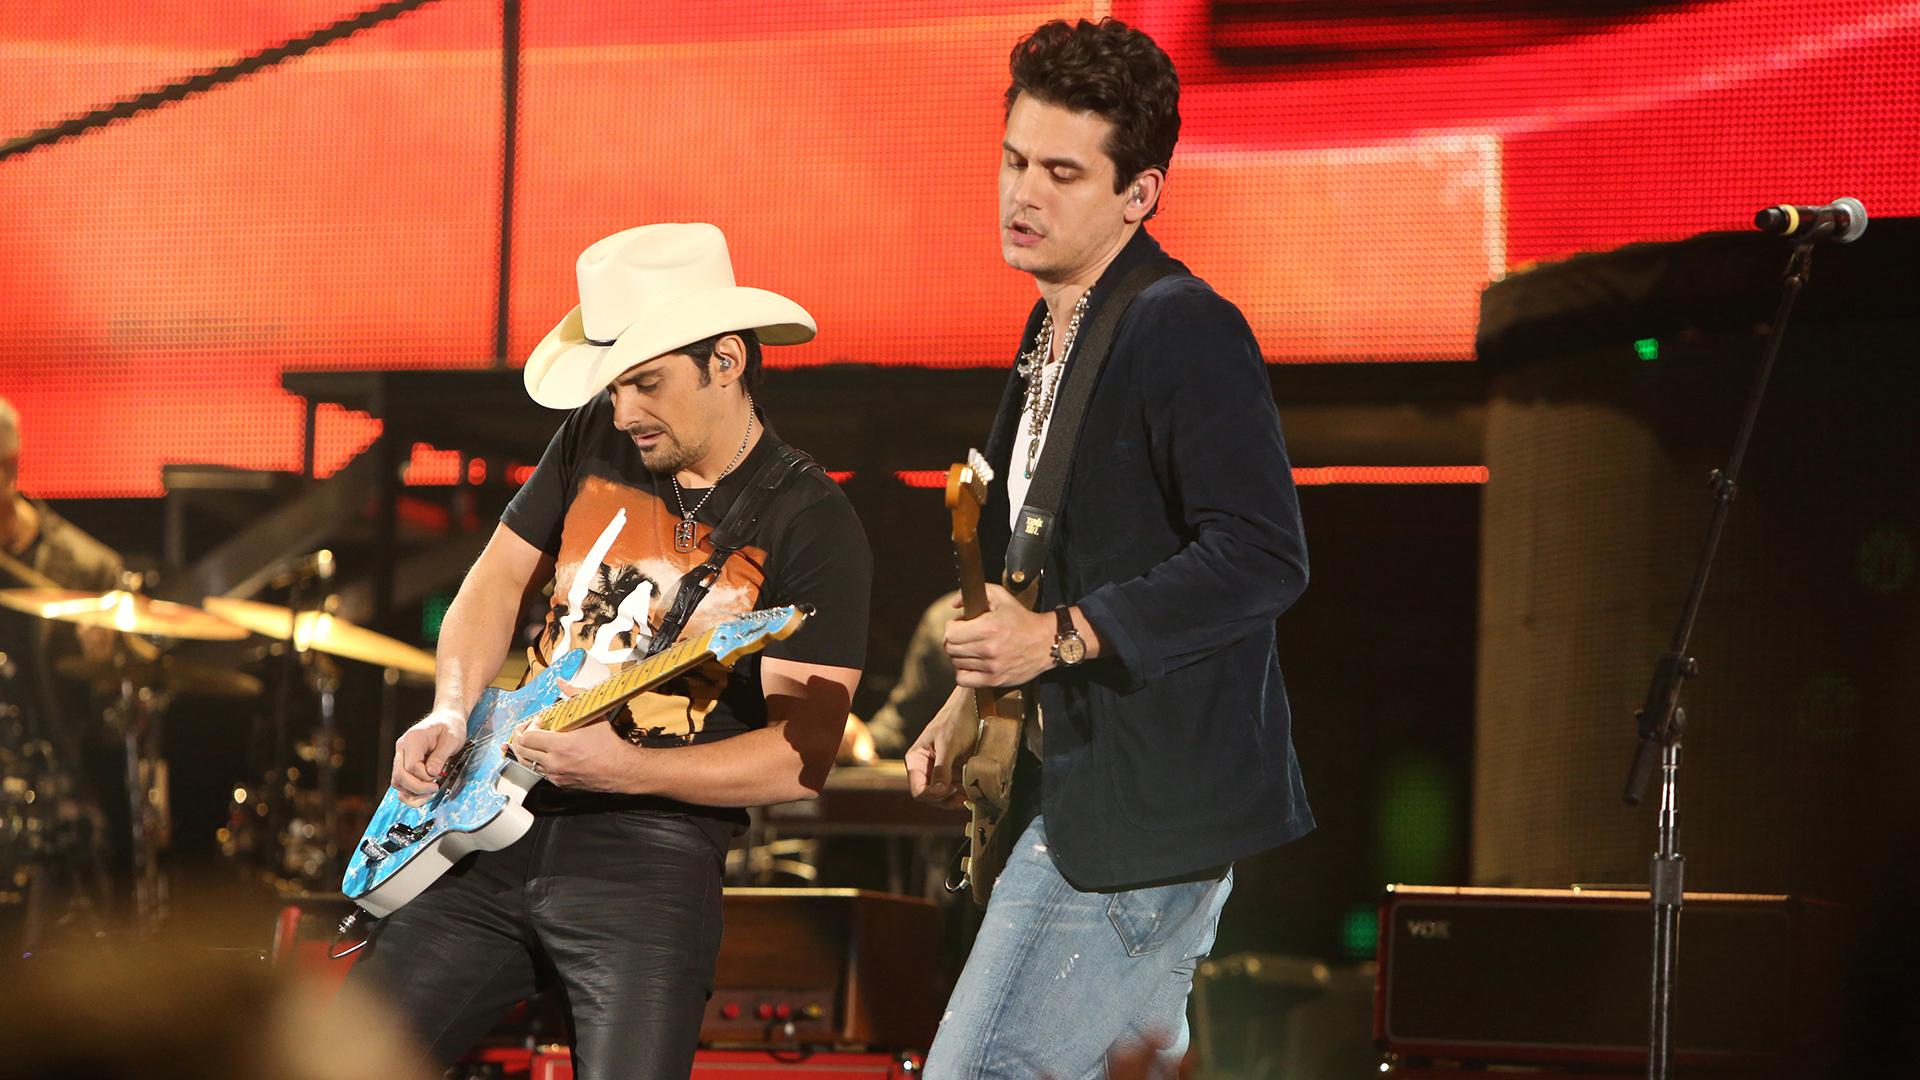 2. Brad Paisley and John Mayer perform